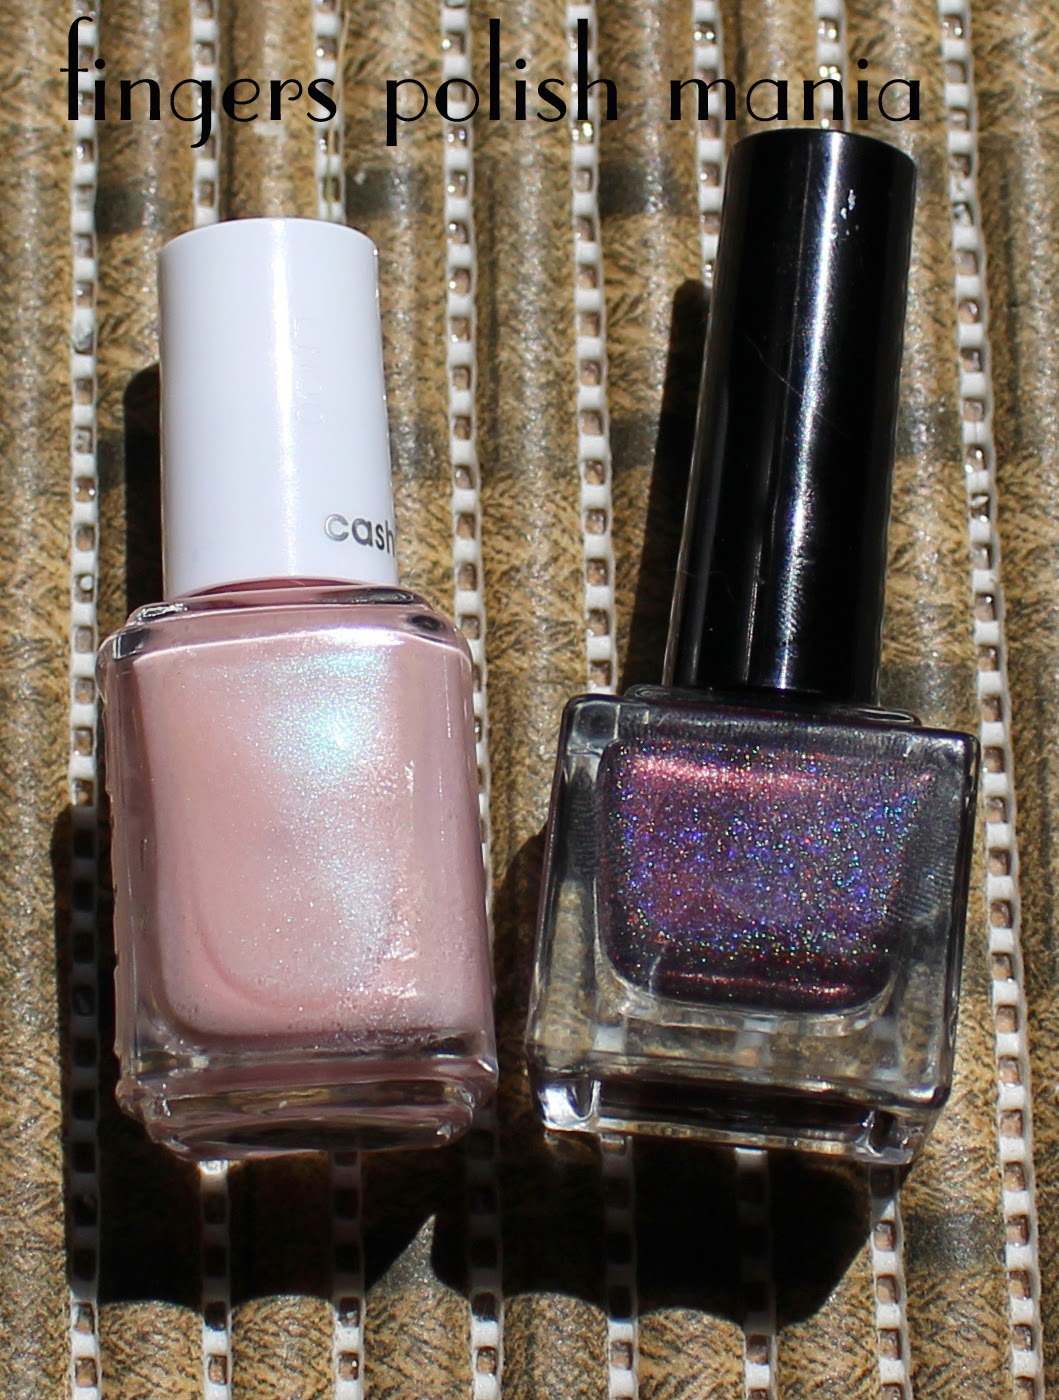 fingers polish mania: Essie Just Stitched